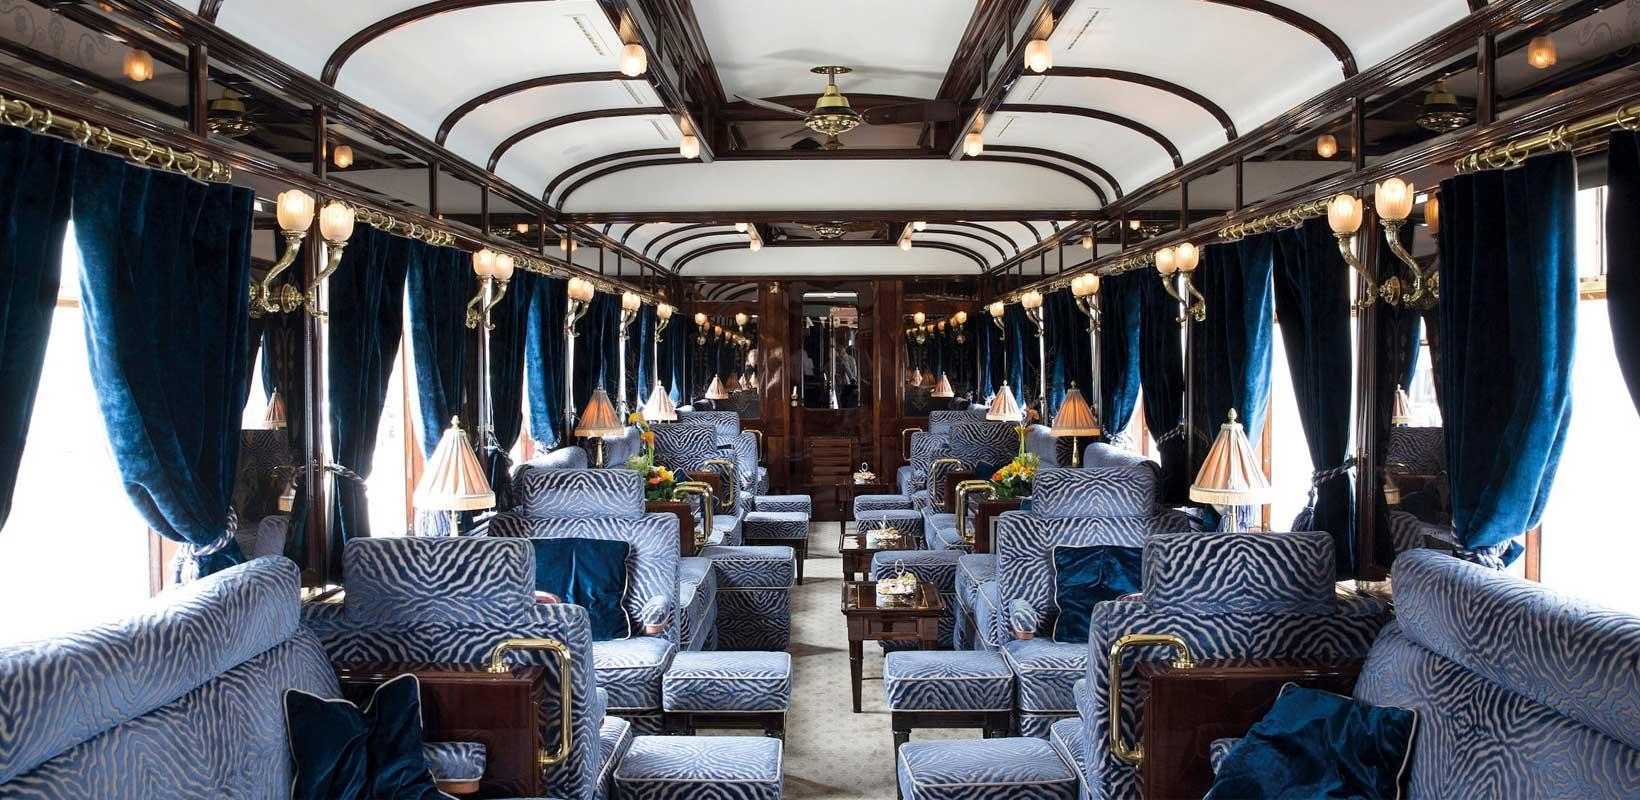 Luxury Train Tips